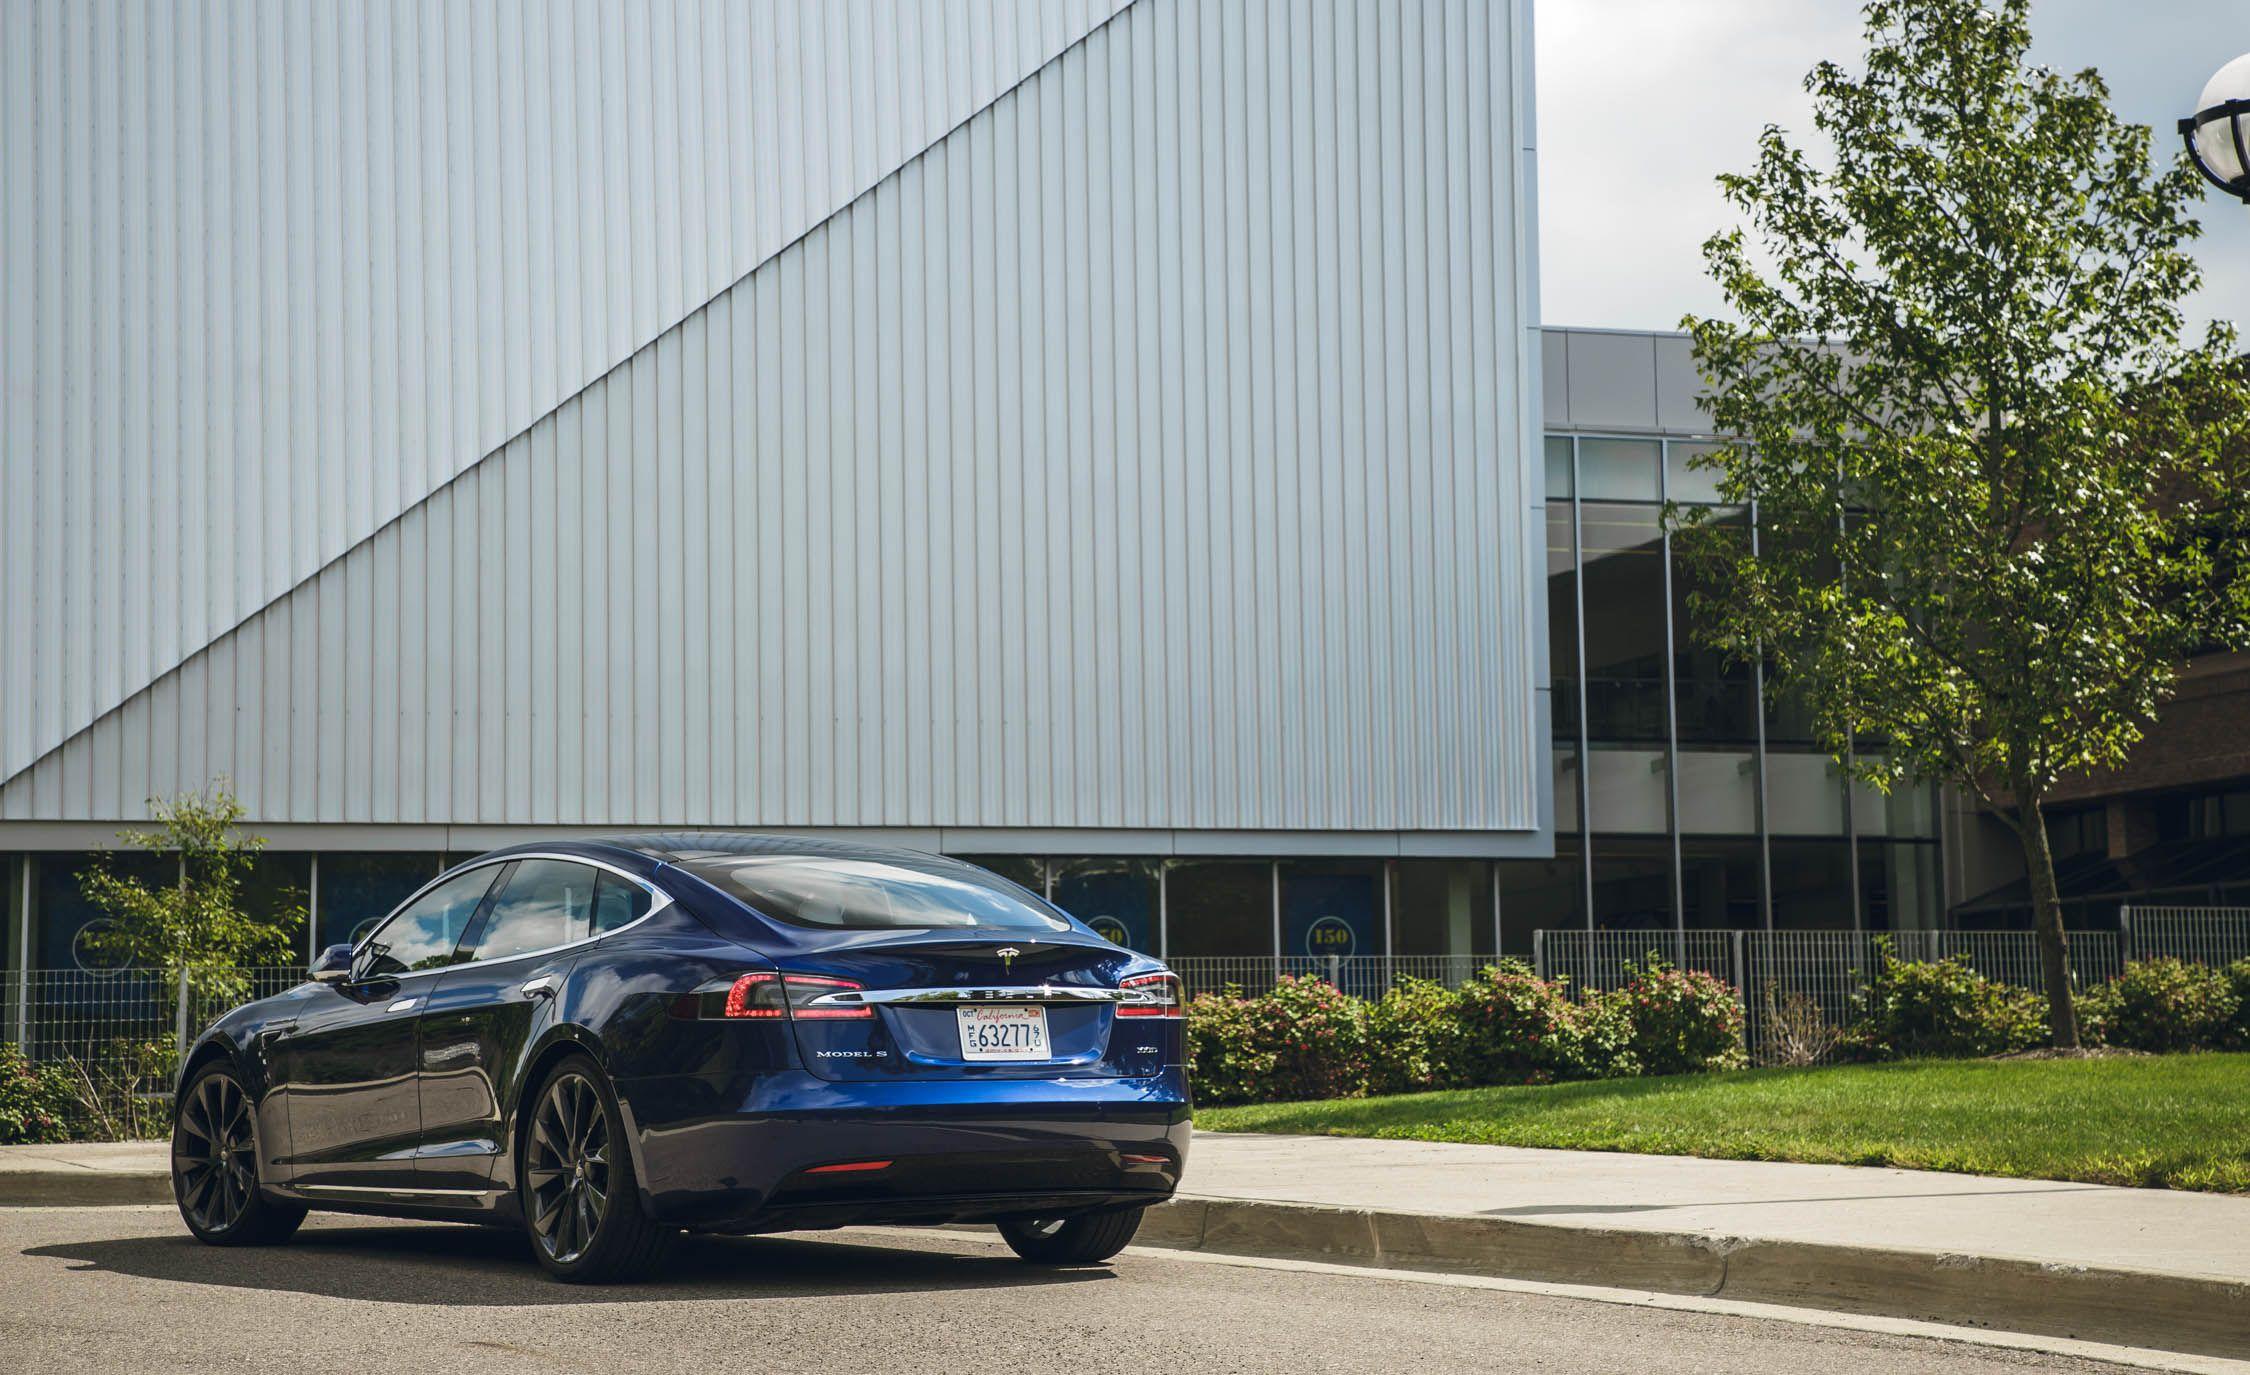 Tesla Model S Reviews Tesla Model S Price s and Specs